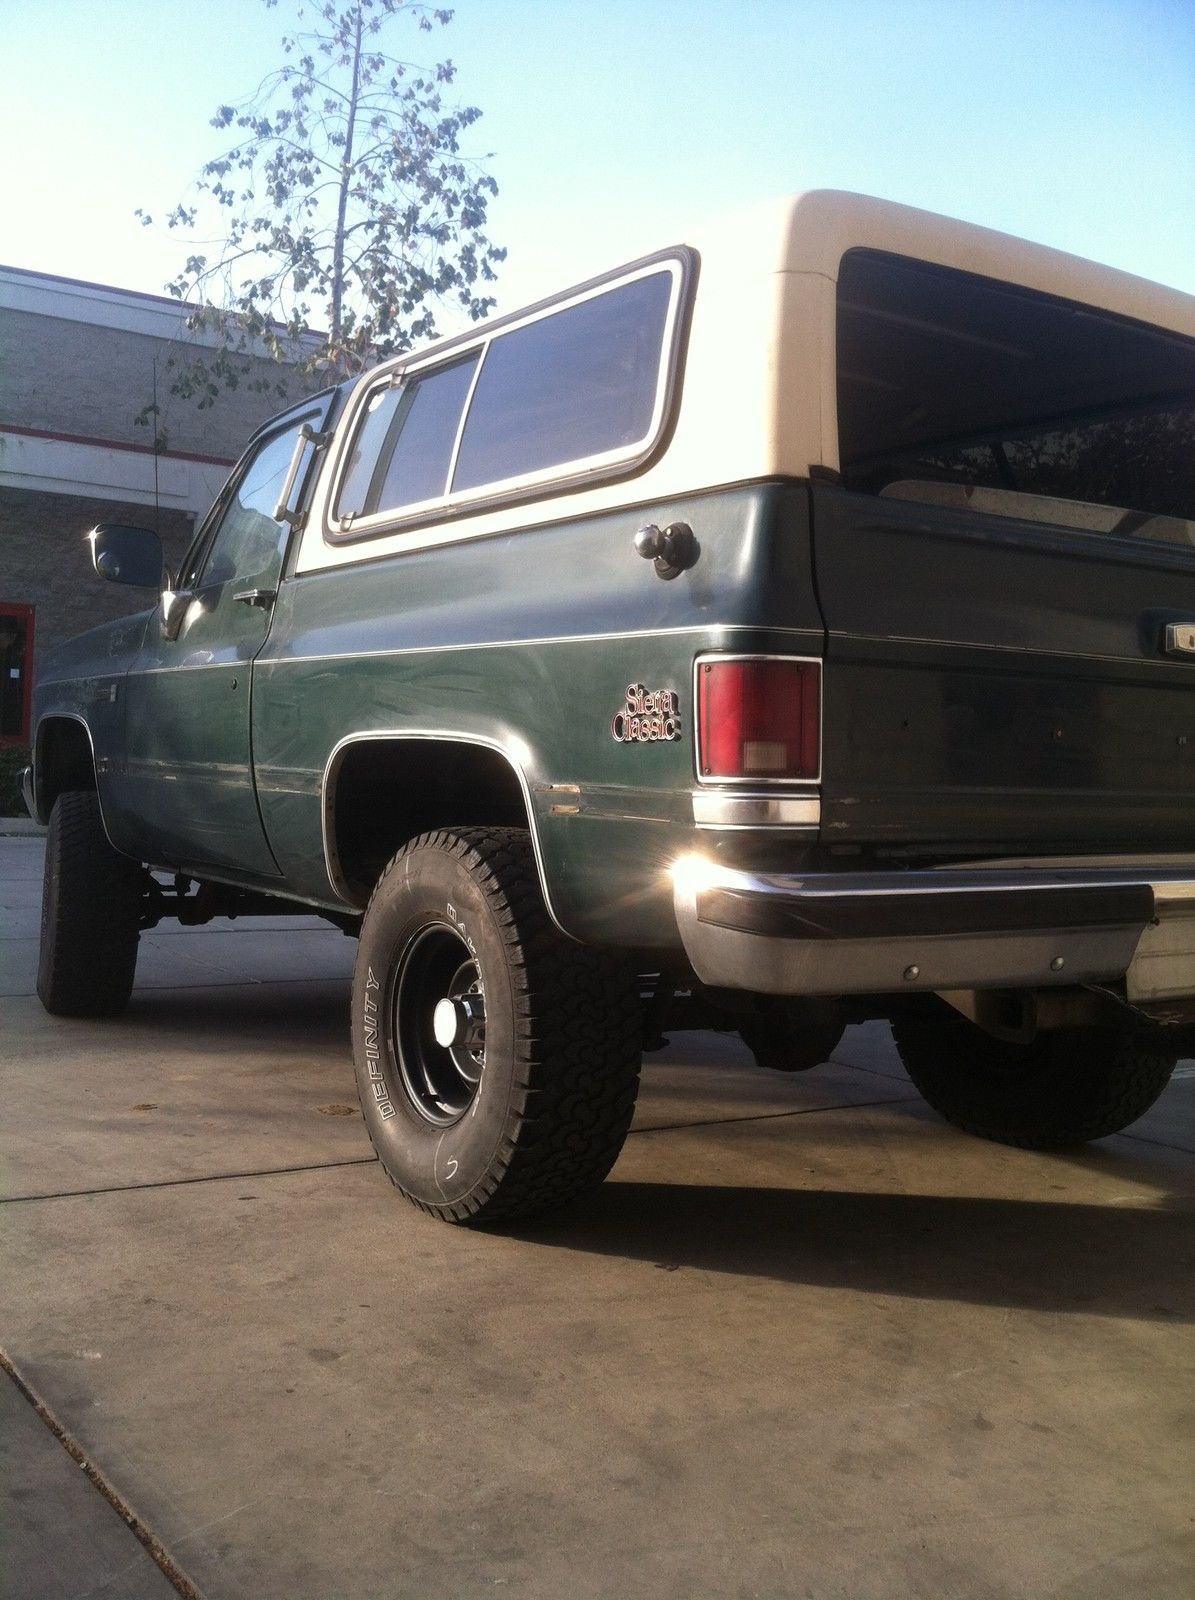 Chevy Blazer Gmc Jimmy 4x4 4wd California Truck Chevrolet K5